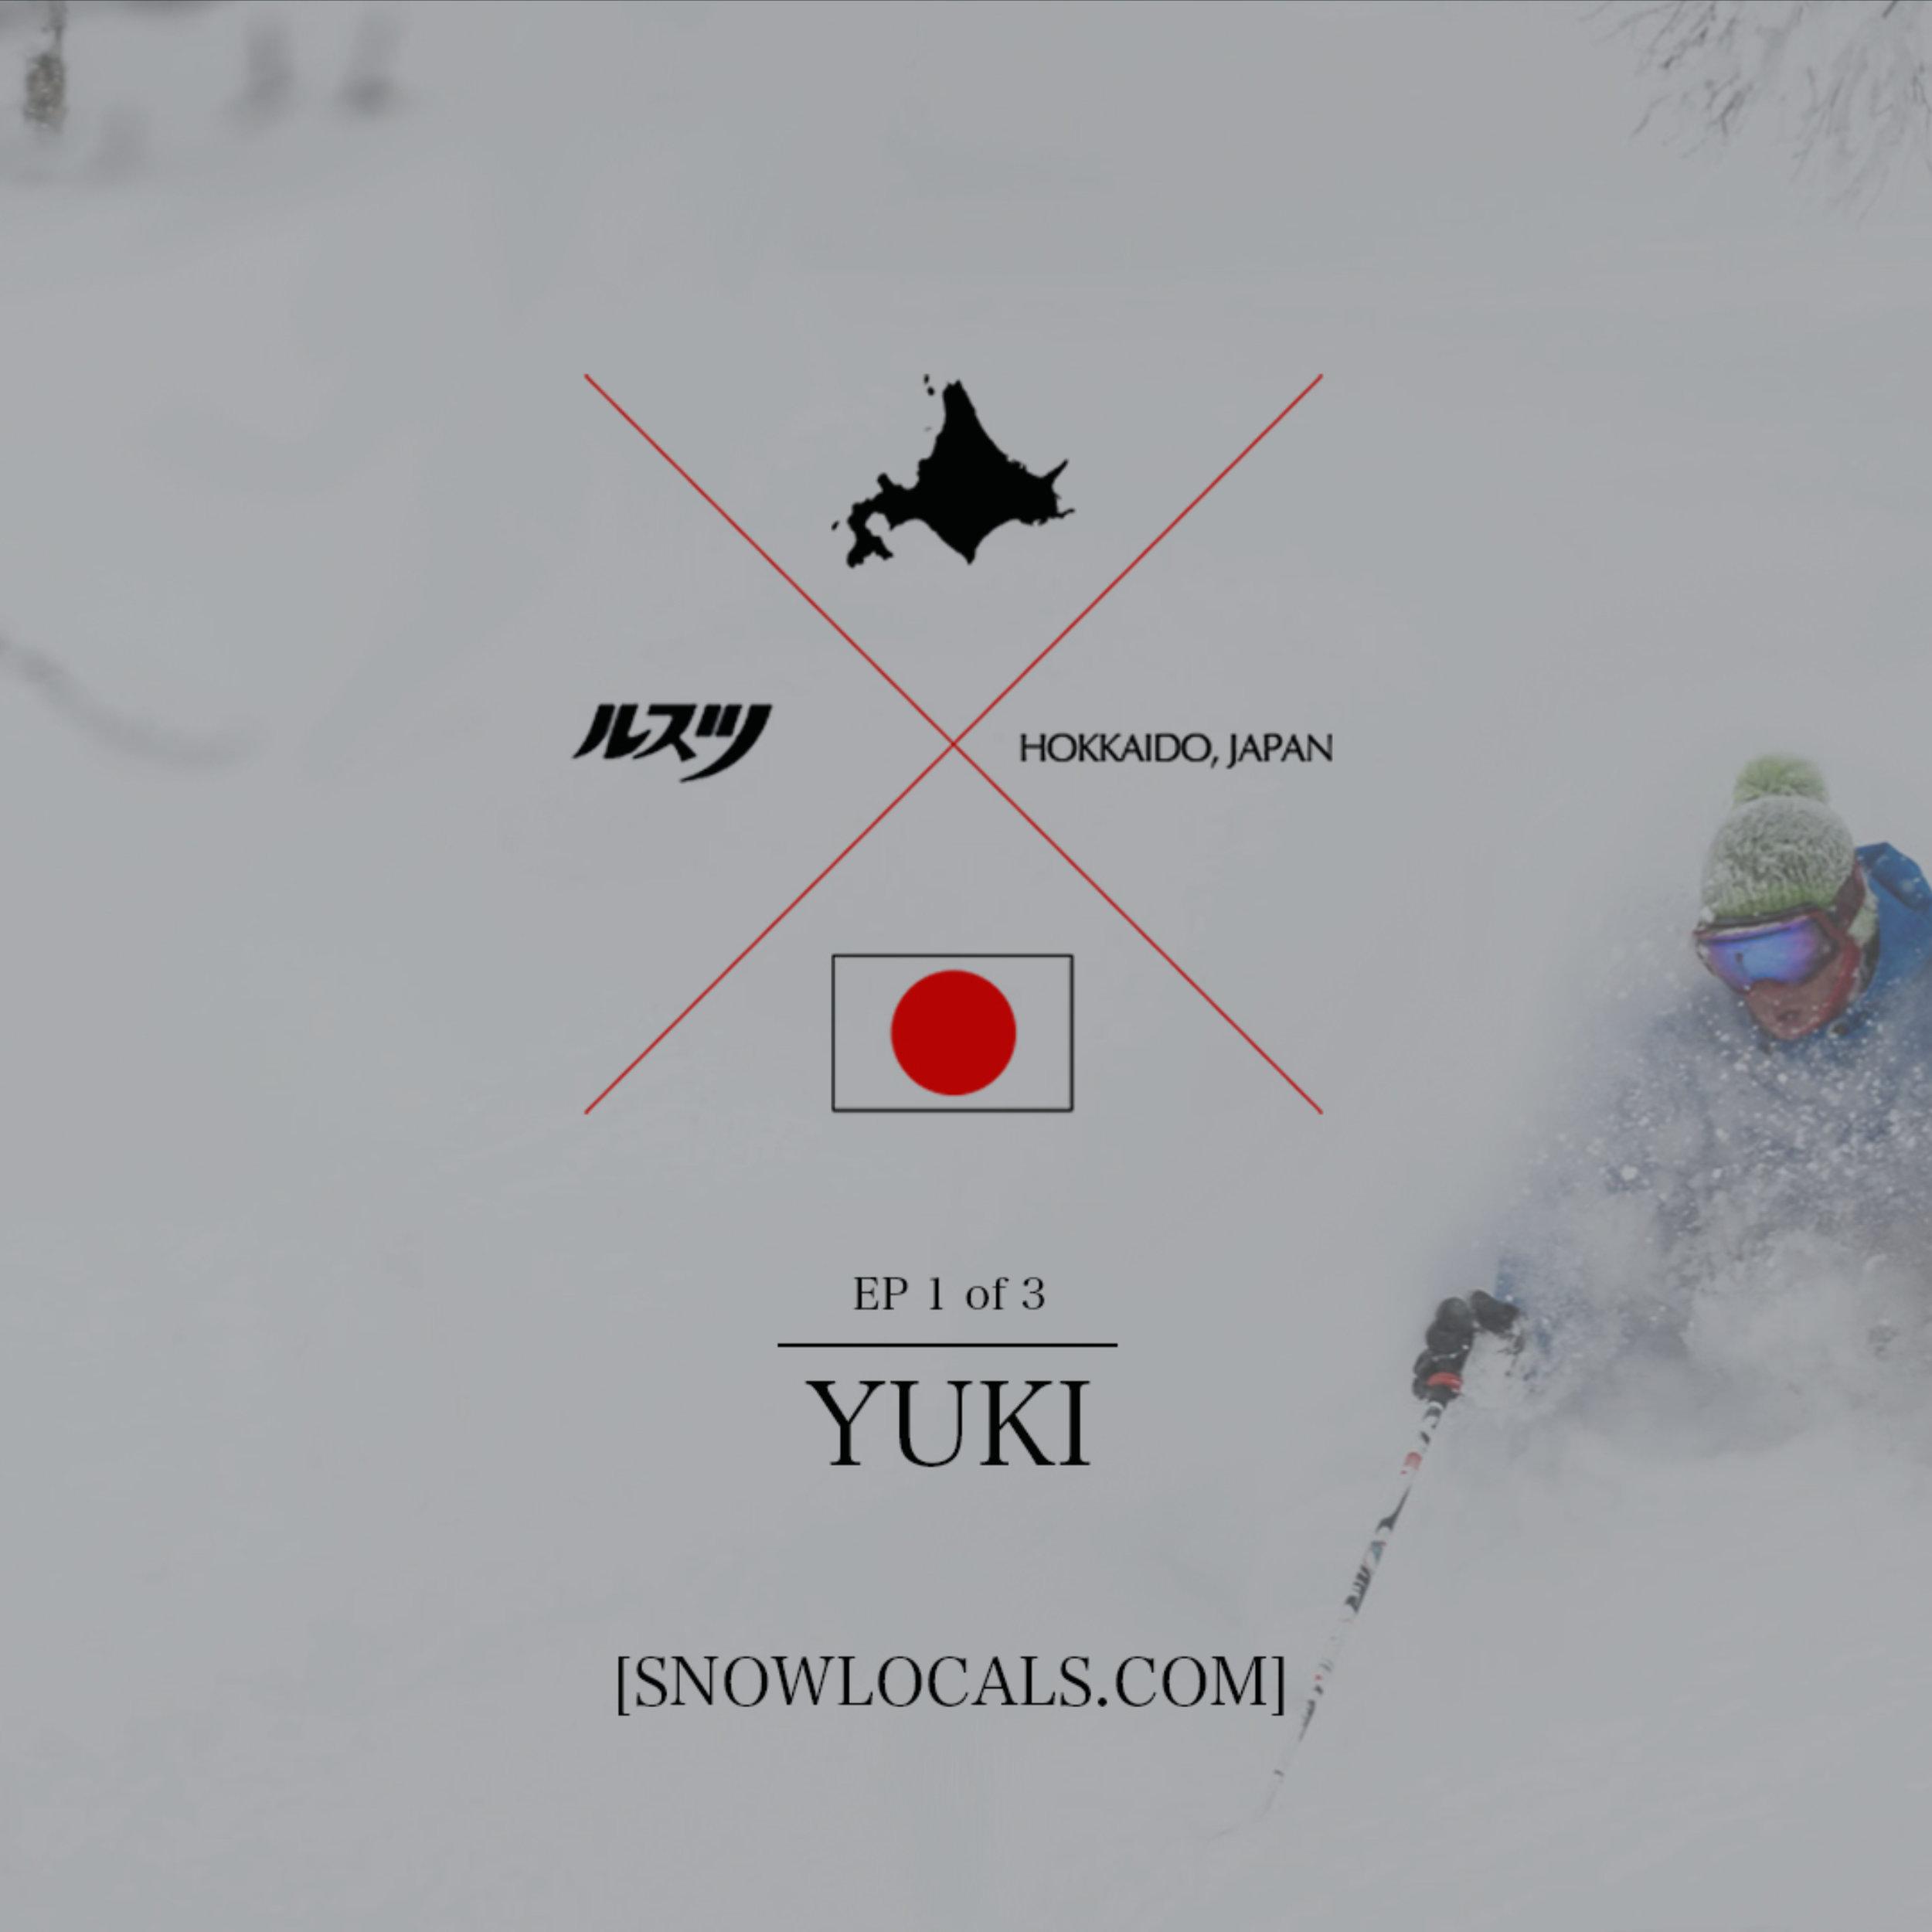 Rusutsu Resort Series - 3-part video series